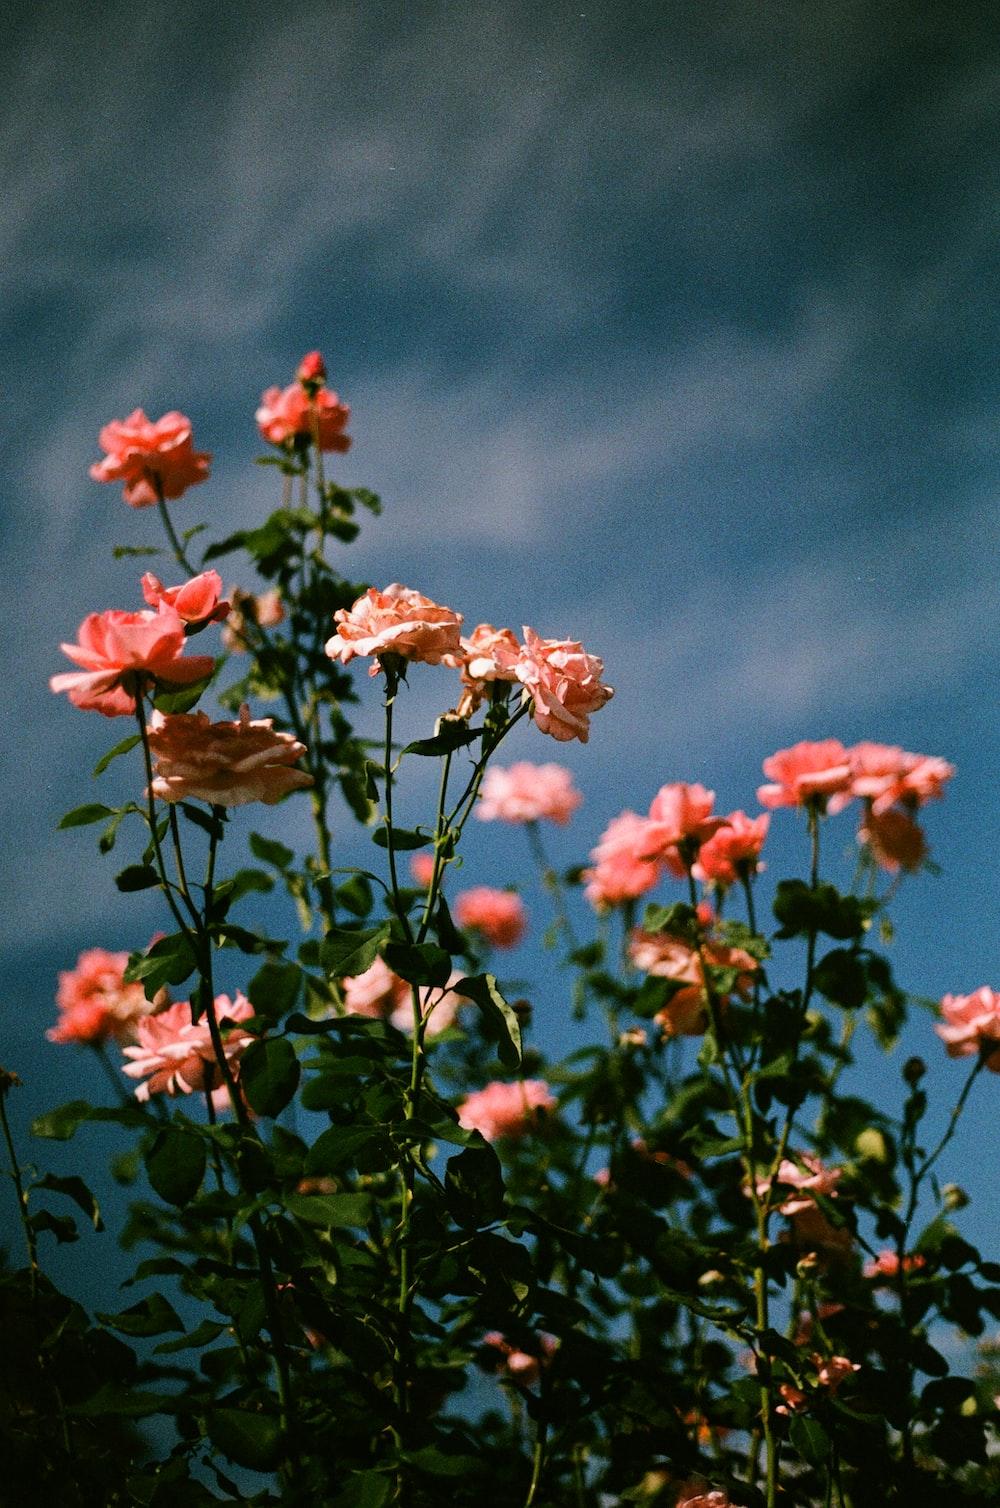 red flowers under blue sky